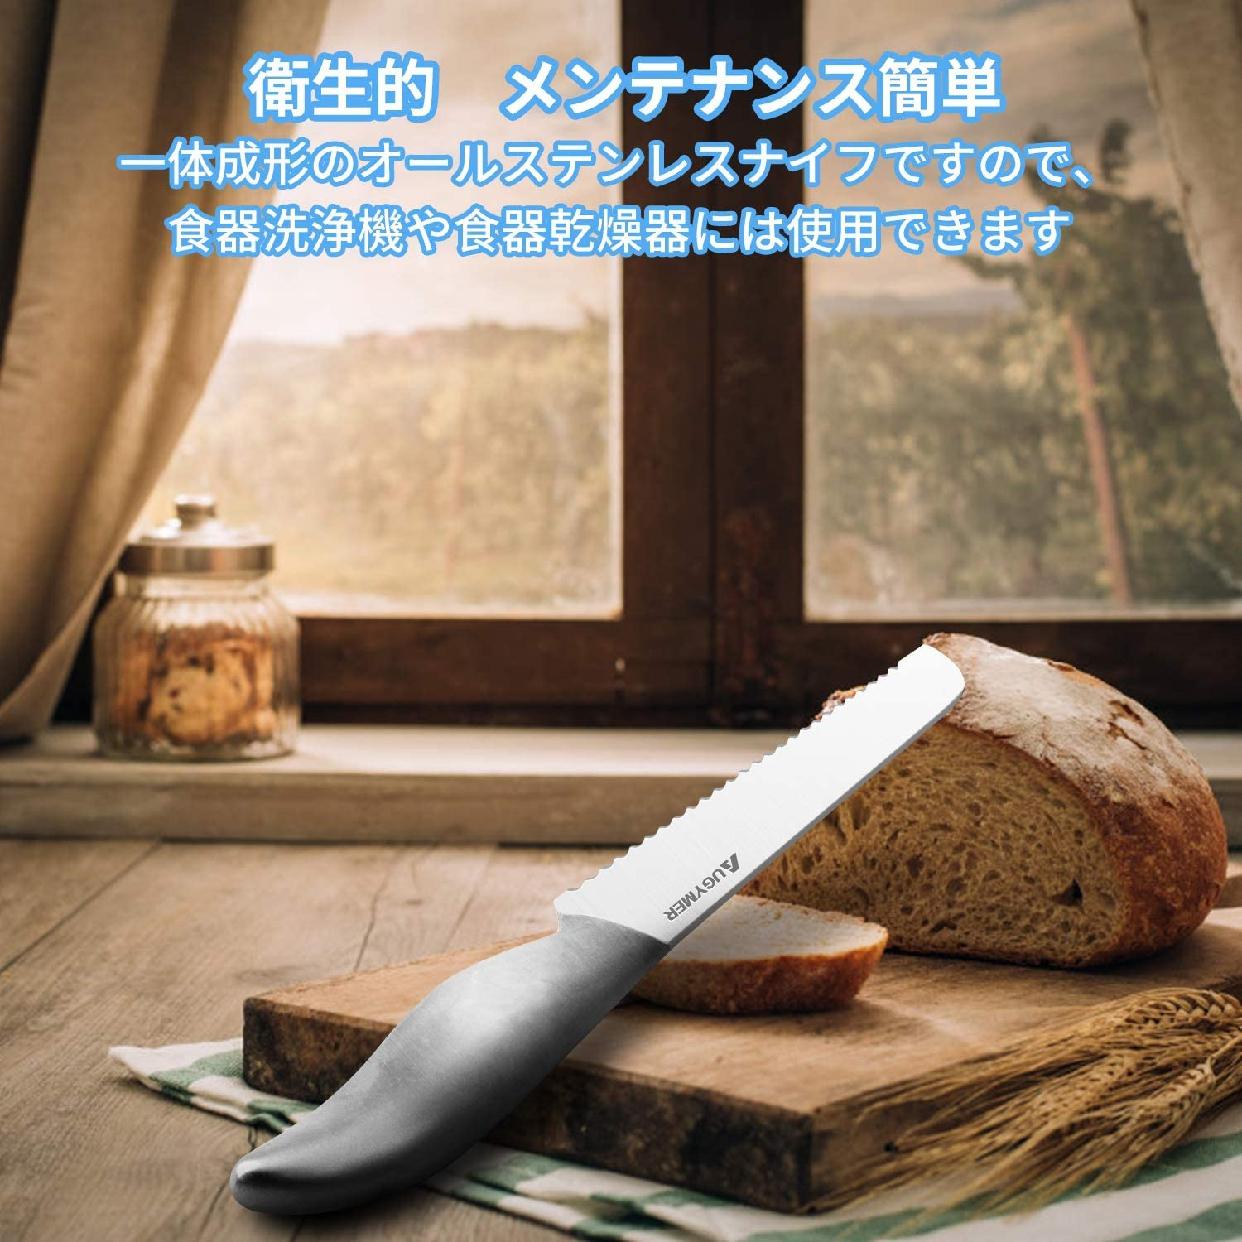 AUGYMER(おうじまー)パン切り包丁 (全長/約32cm) シルバーの商品画像2